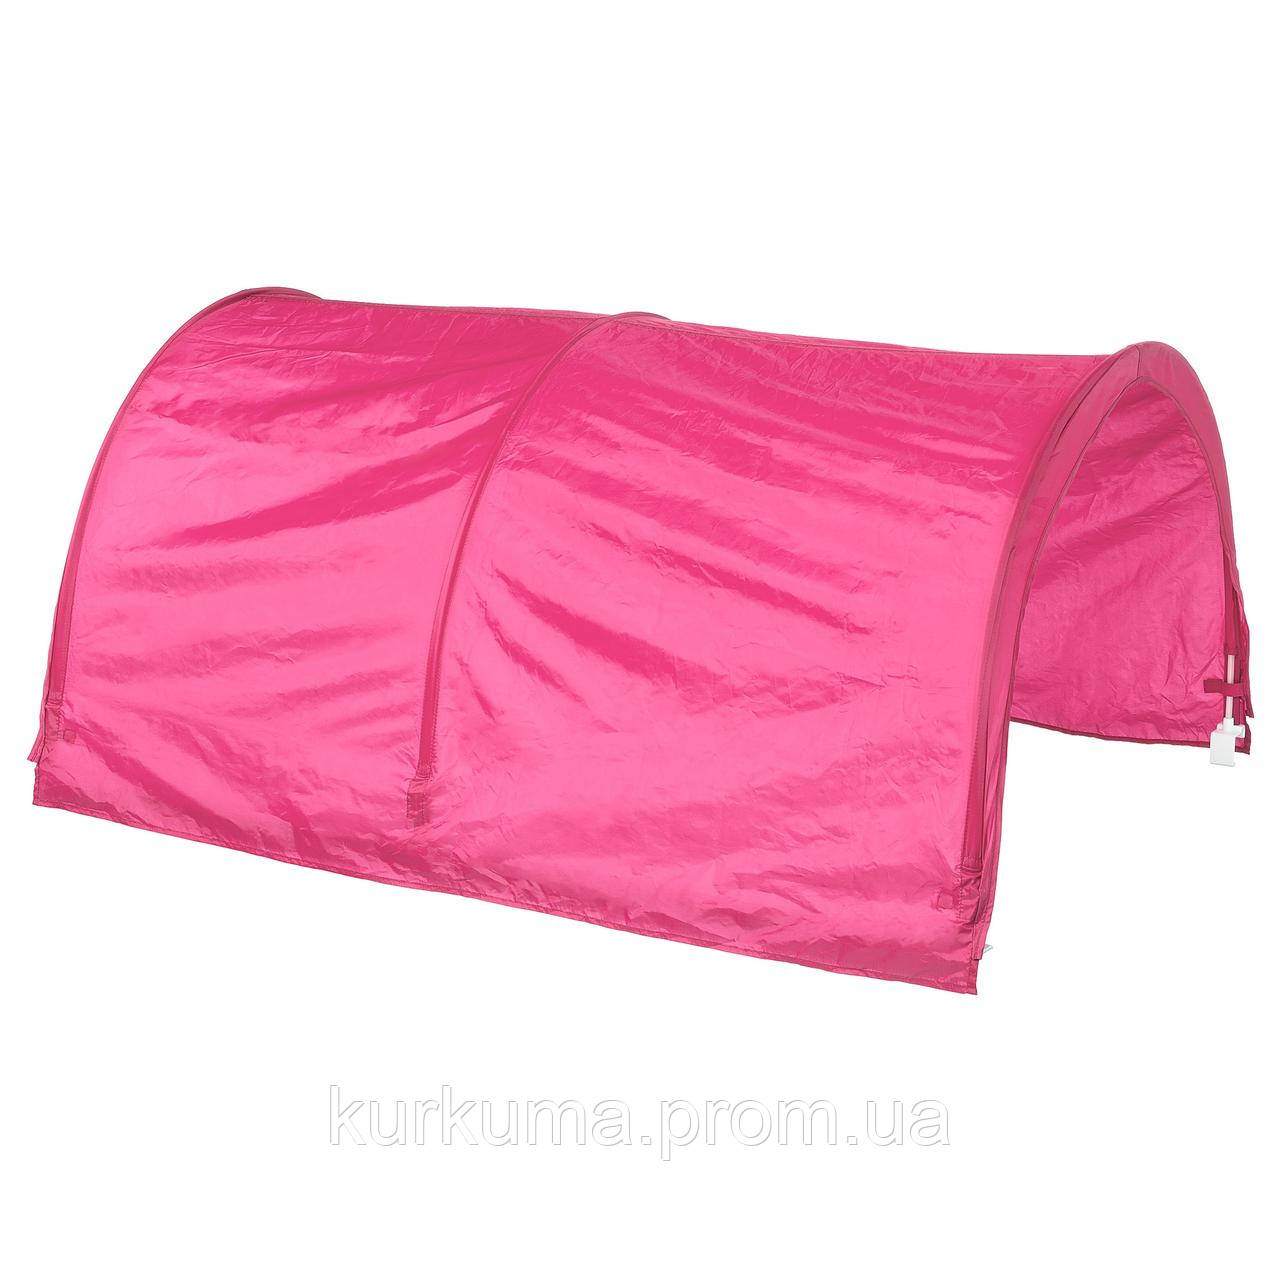 IKEA KURA Навес, розовый  (103.112.28)